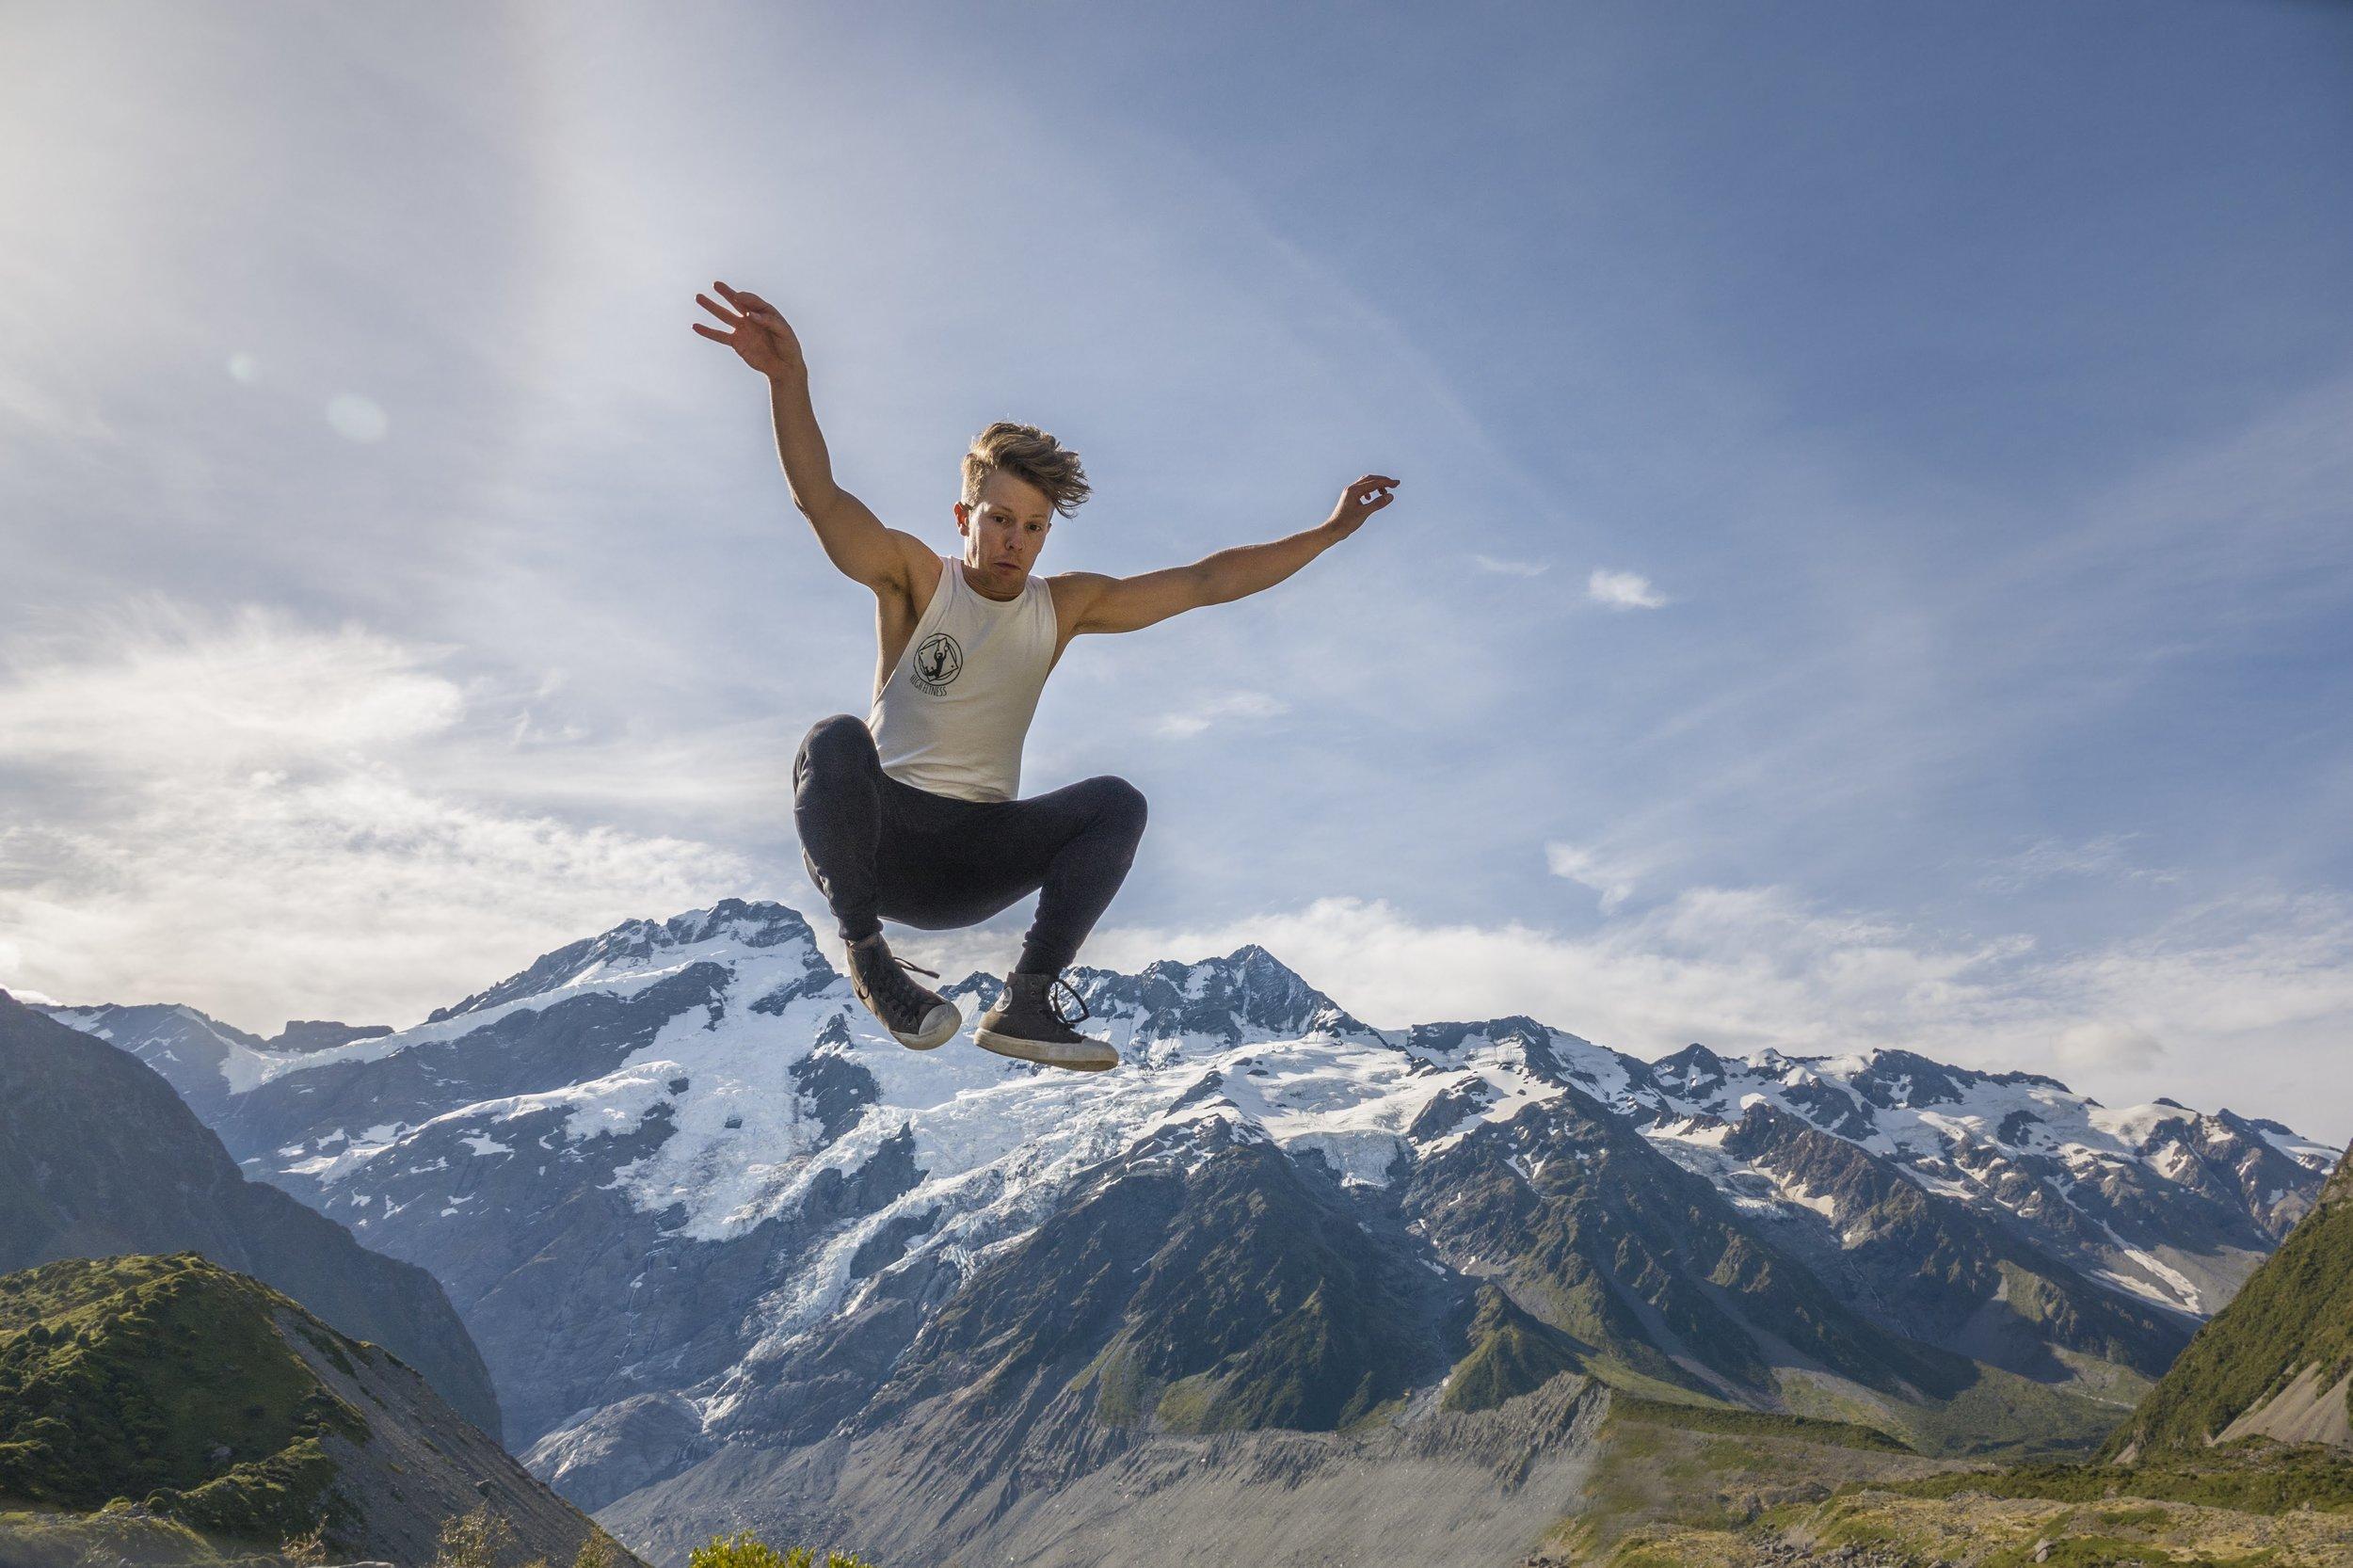 Finally jumping mountains